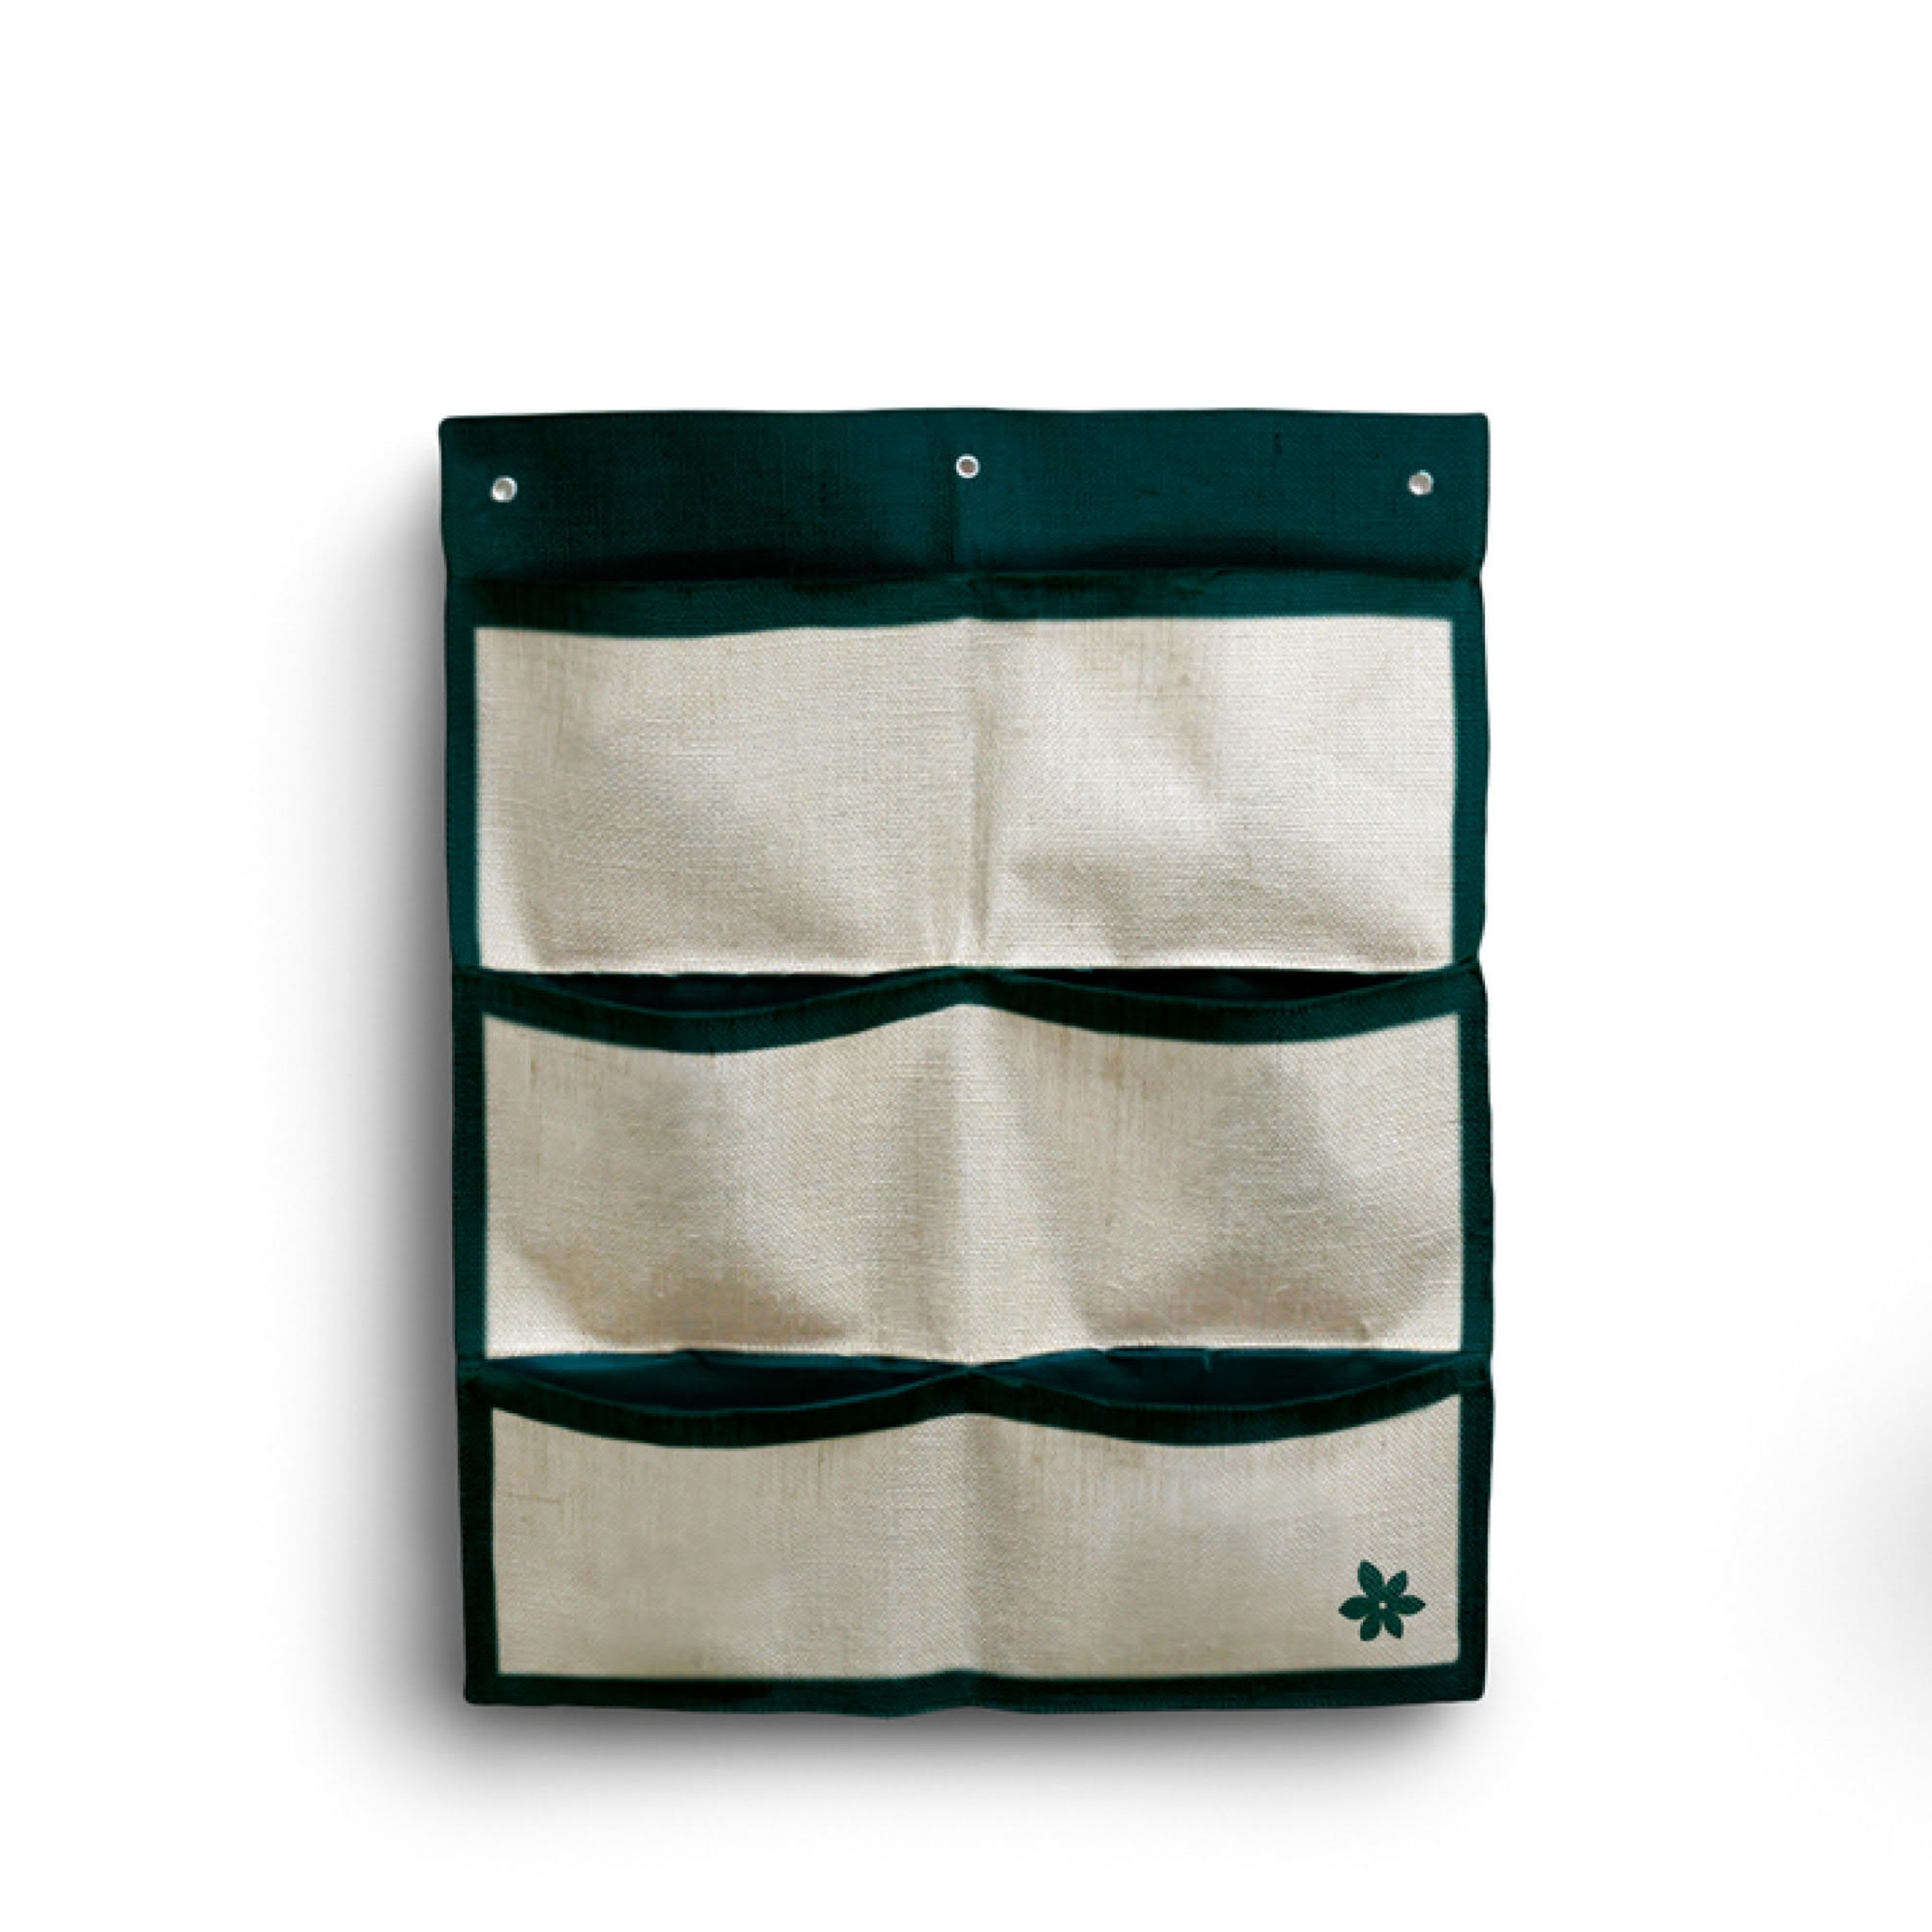 FACTORY MADE.6 POCKET PE AND JUTE MATERIAL GARDEN WALL HANGING PLANTER GROW BAG.JUTE VERTICAL PLANTER